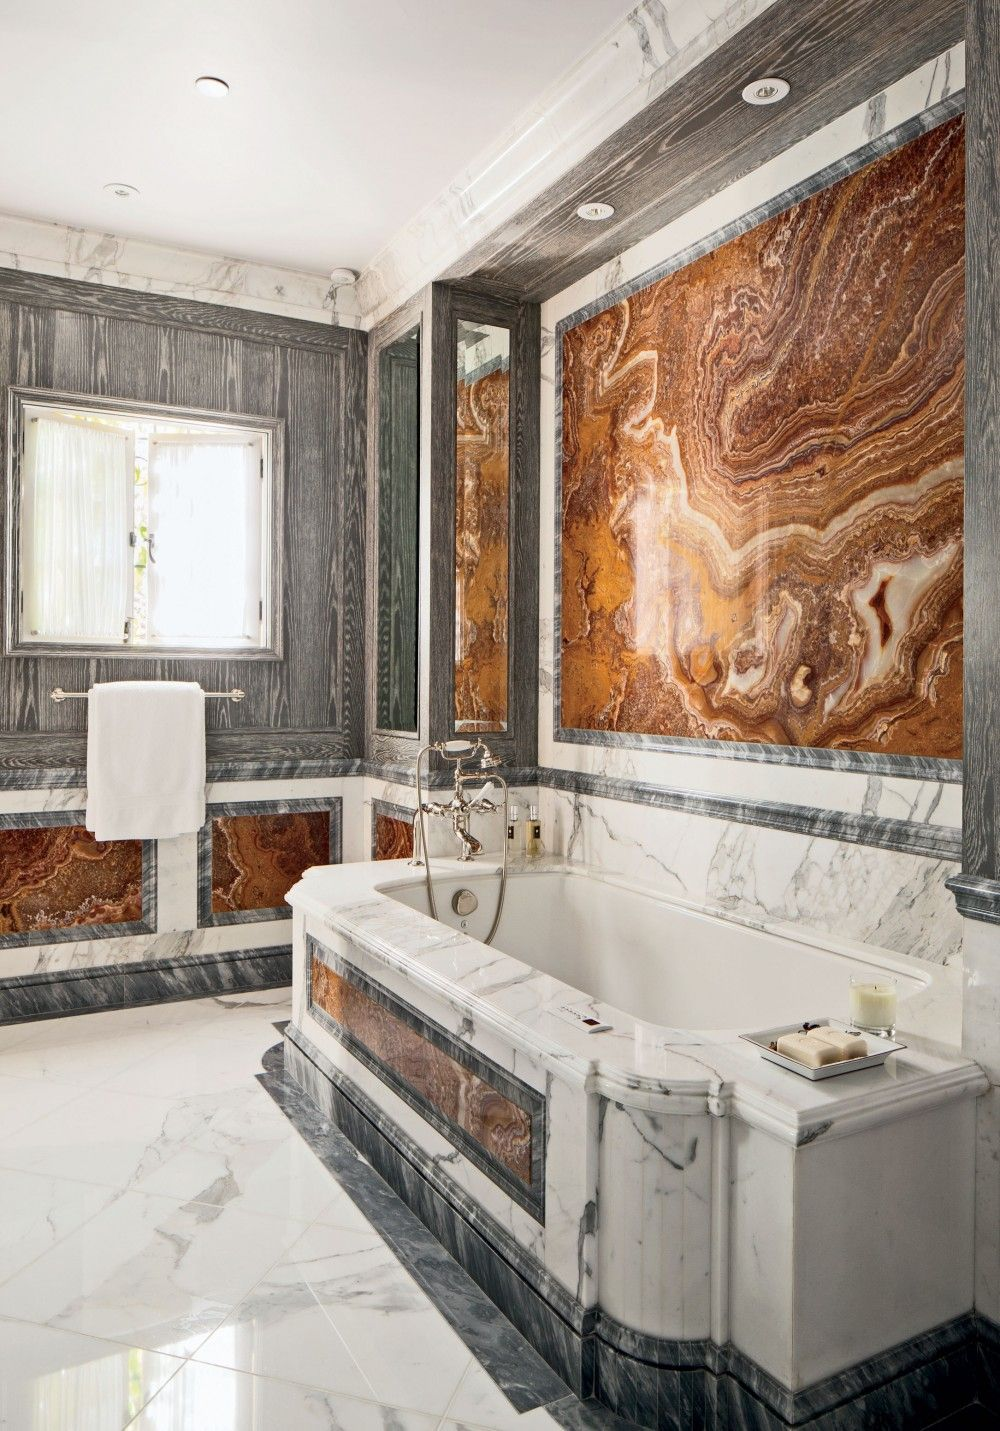 Exotic Bathroom By JP Molyneux Studio Ltd. In Pebble Beach, CA